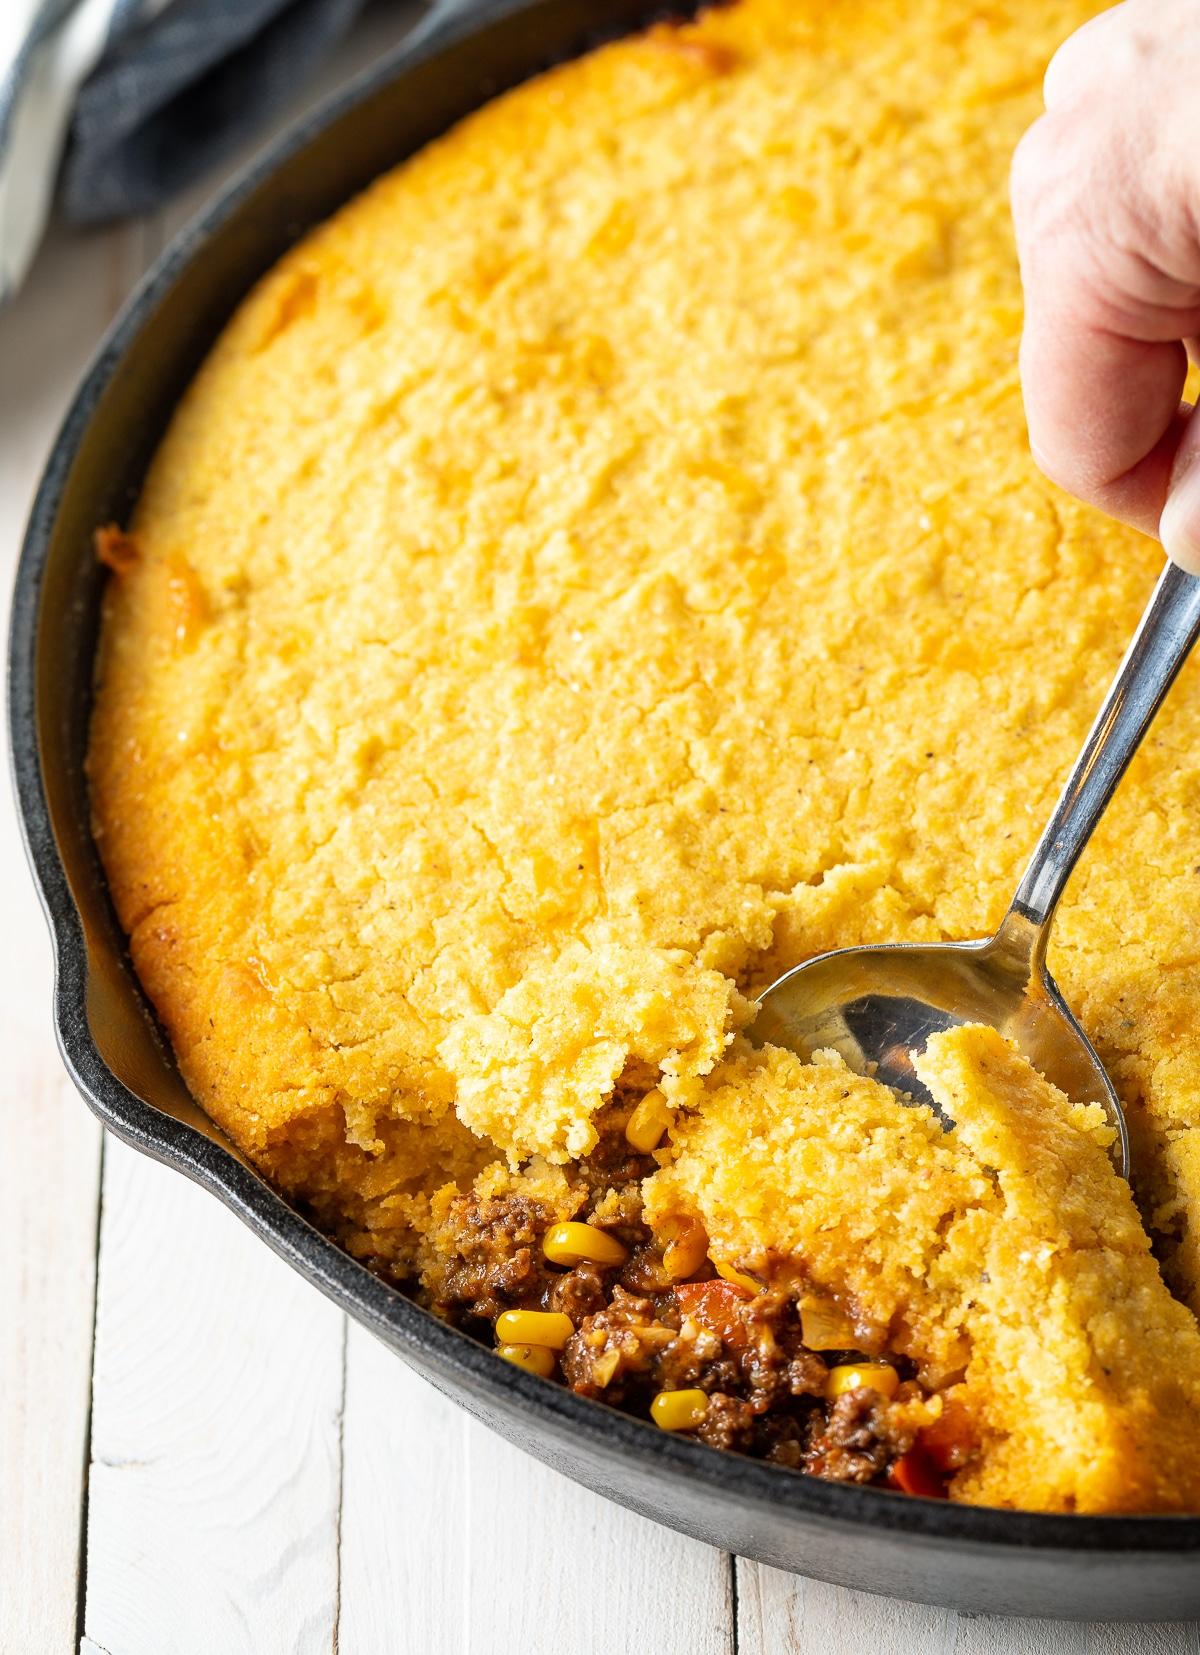 Must-Try Perfect Tamale Pie Recipe - Easy to Make and Gluten Free! #tamales #tamalepie #glutenfreedinner #glutenfreerecipe #aspicyperspective